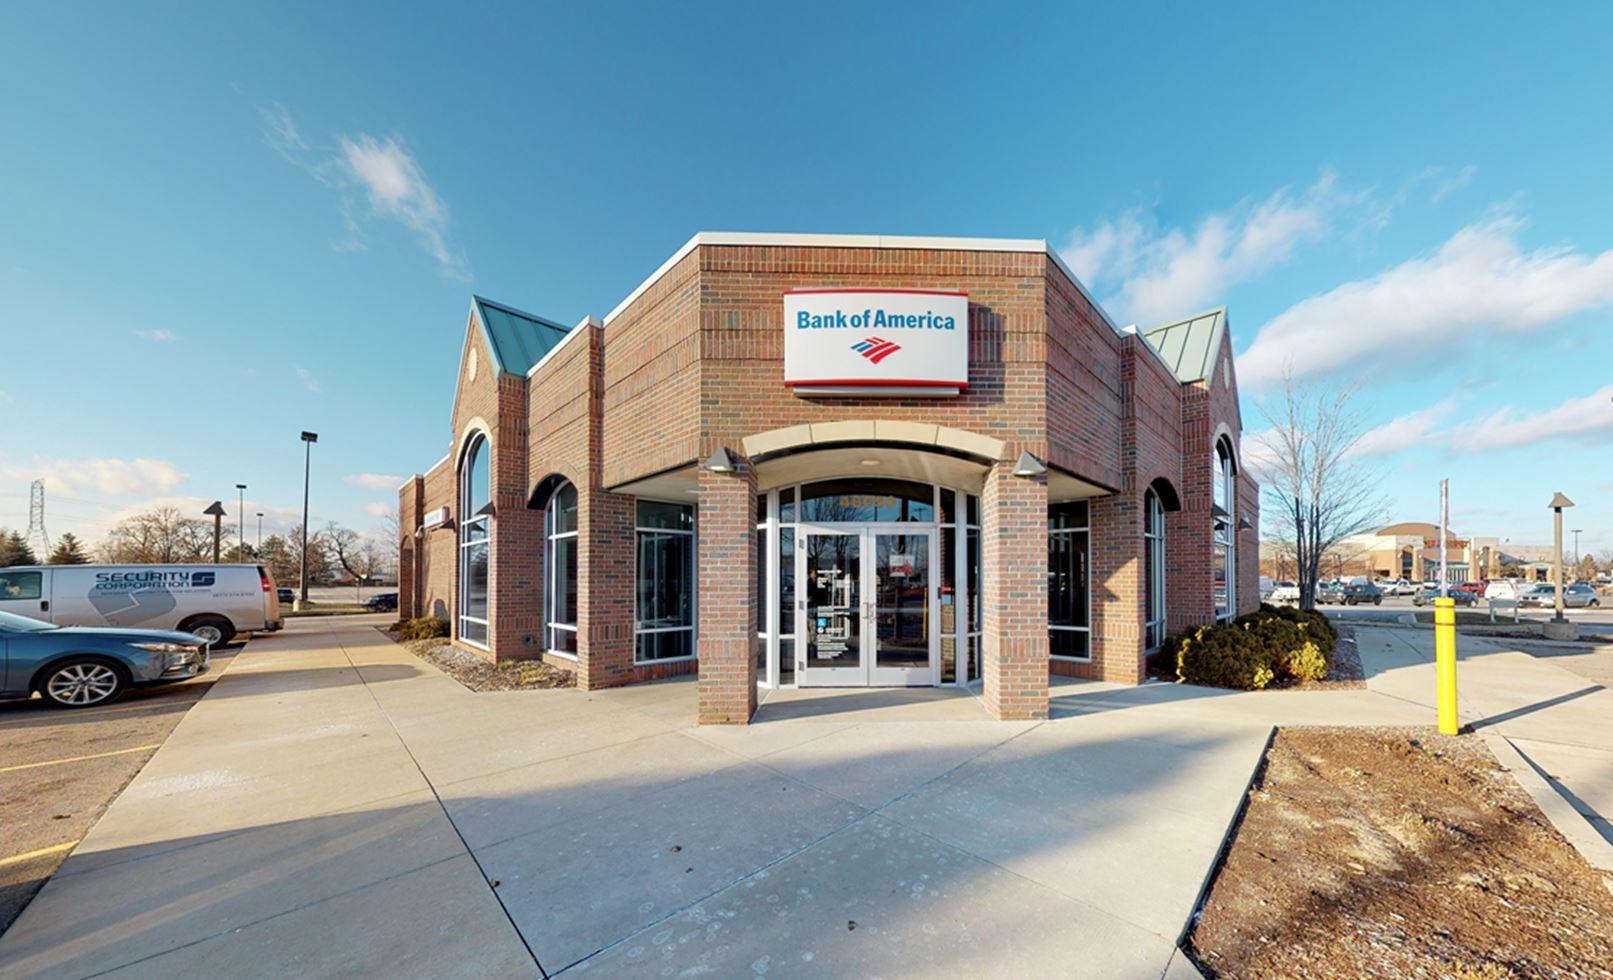 Bank of America financial center with drive-thru ATM | 48050 Grand River Ave, Novi, MI 48374